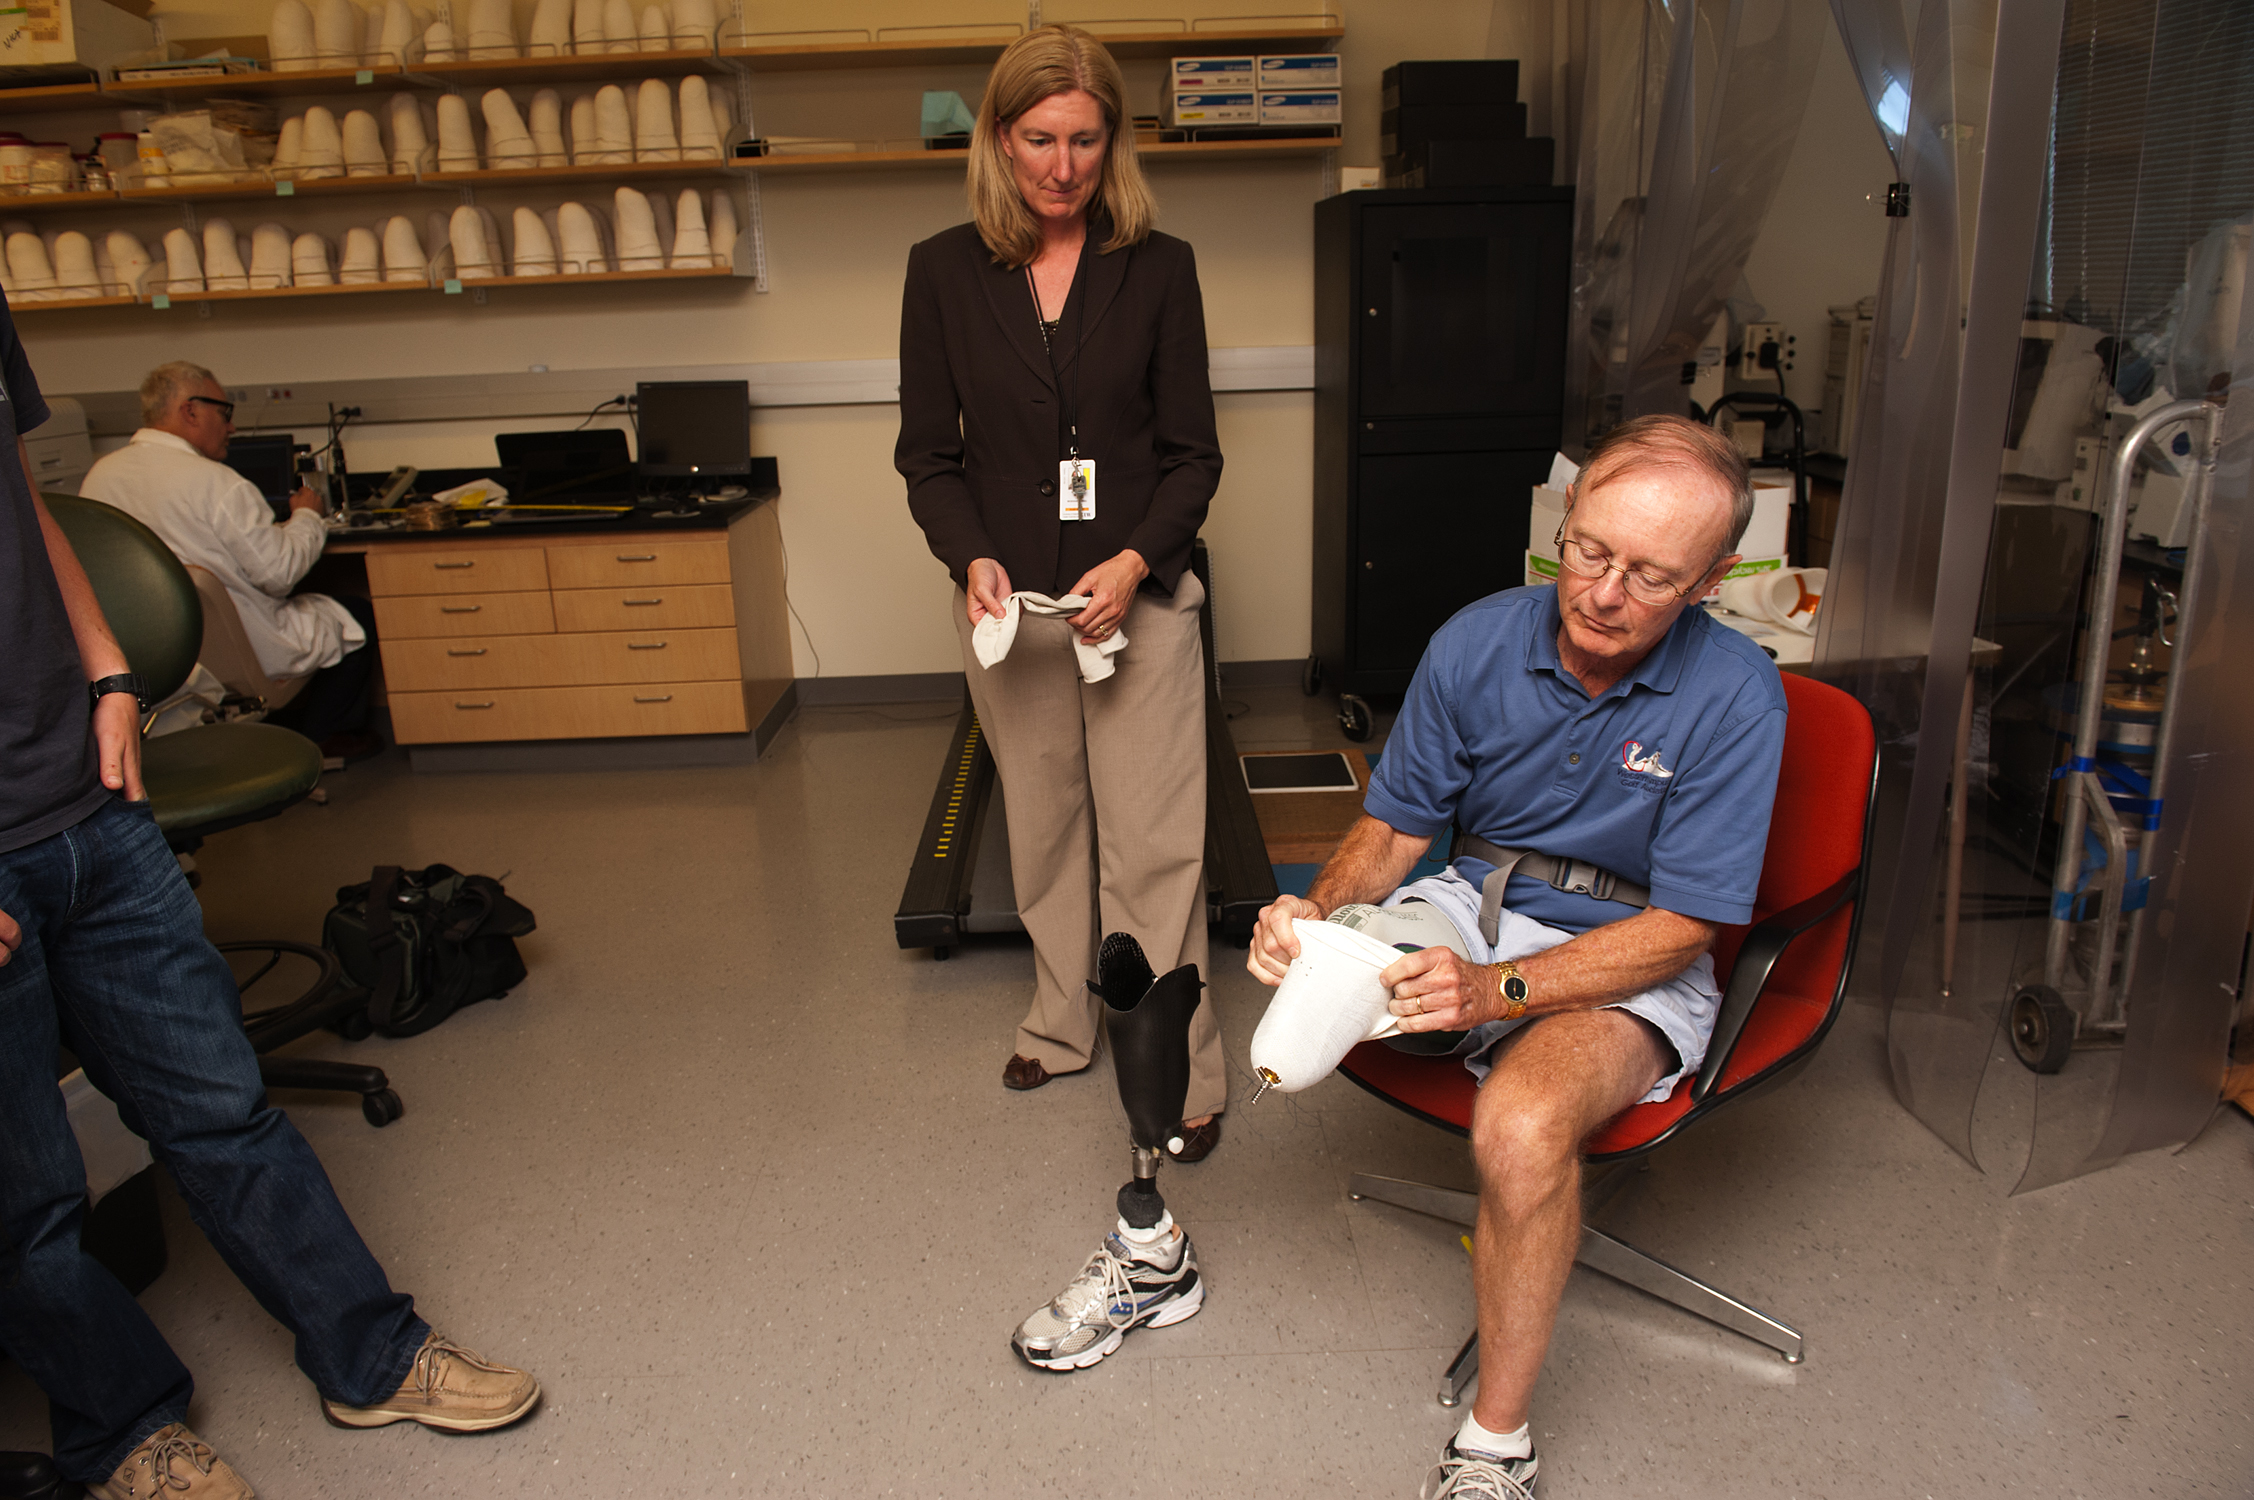 Ron Bailey puts on his prosthetic leg.